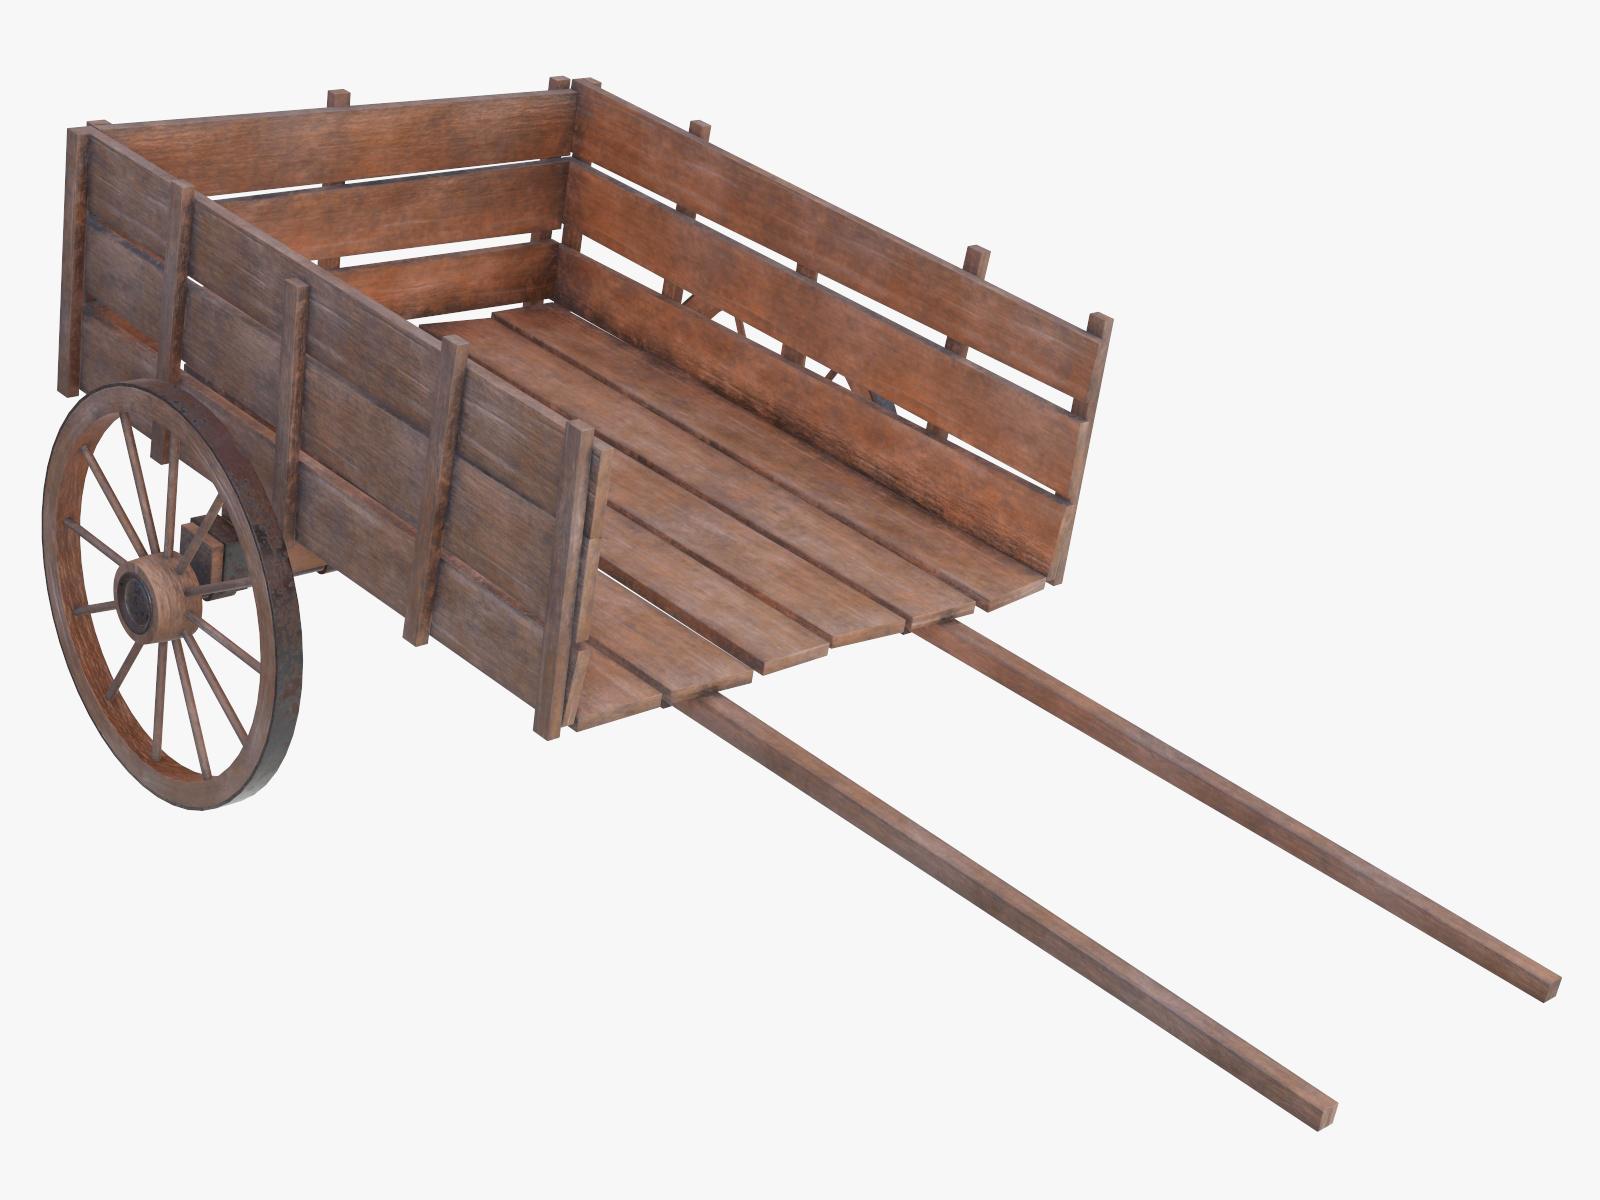 _wooden_cart_31.jpgE04C0464-EFA1-4C24-96